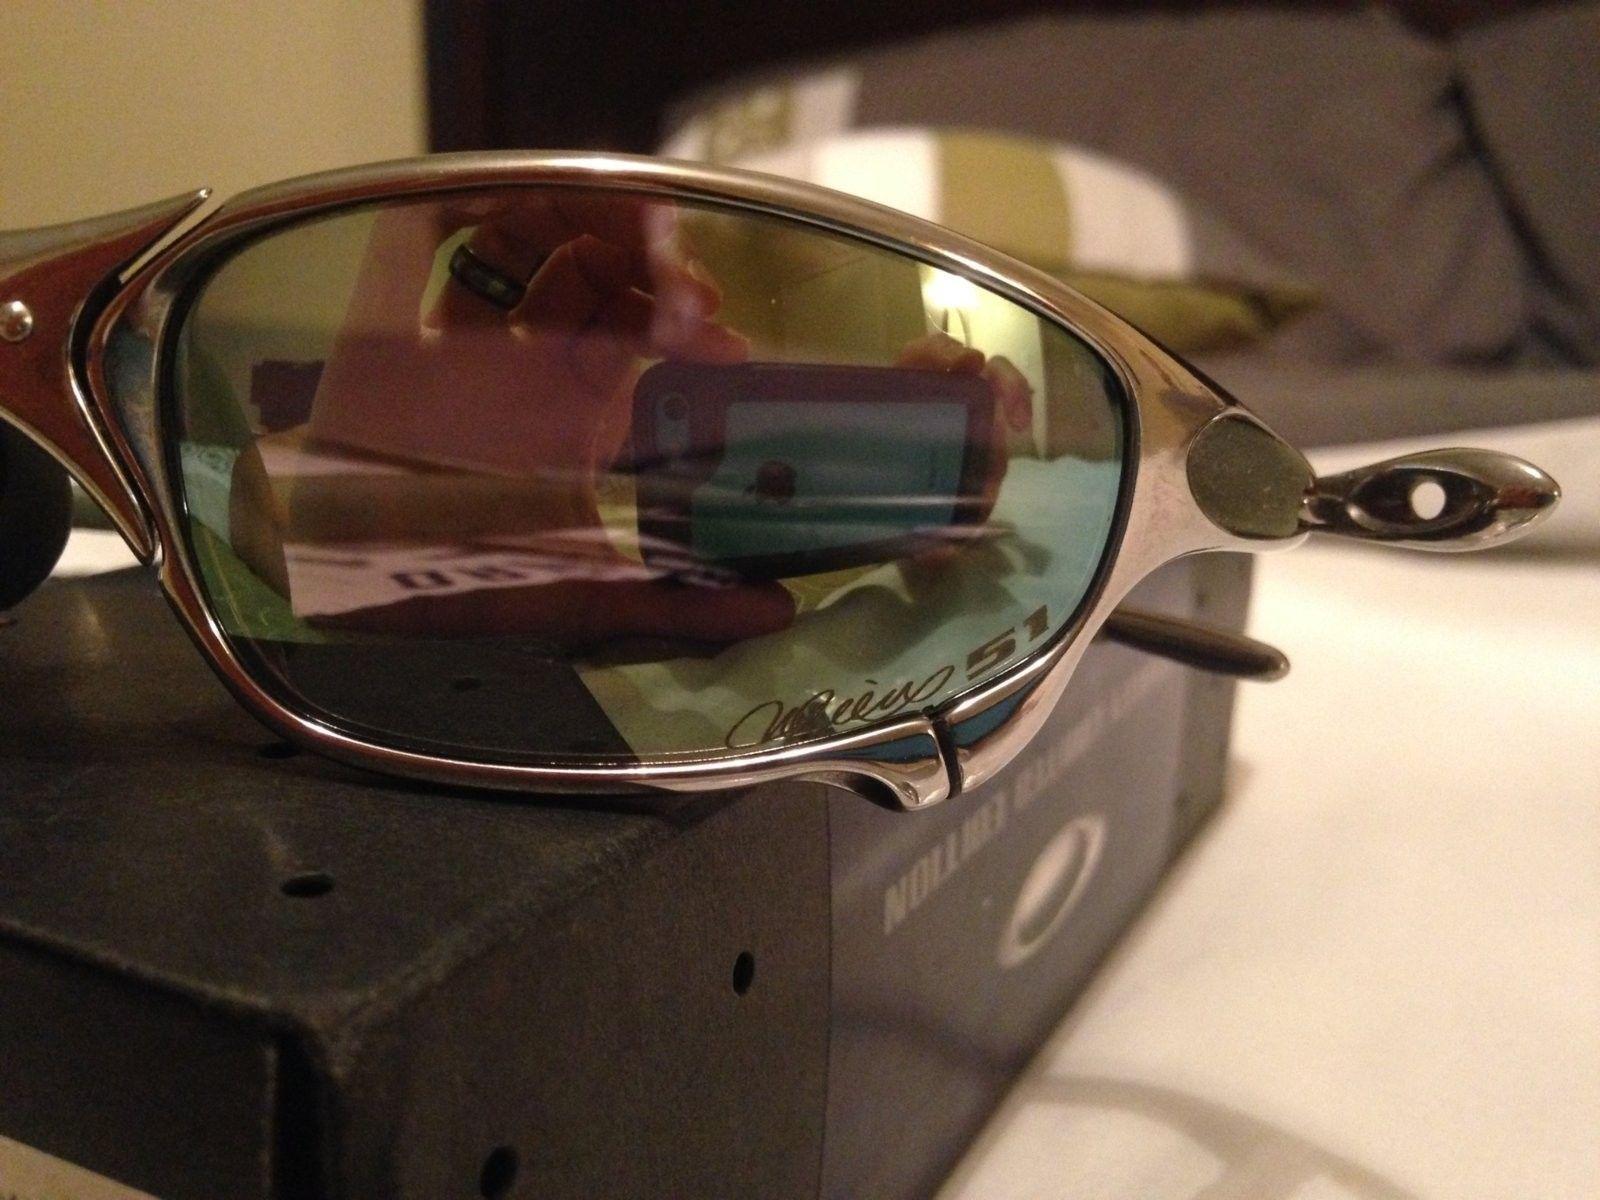 Polished/Emerald Ichiro Juliet (Non-Serial)- $365 OBO - 9CB278B4-90CB-49C1-BF02-460CDCB570DF.JPG